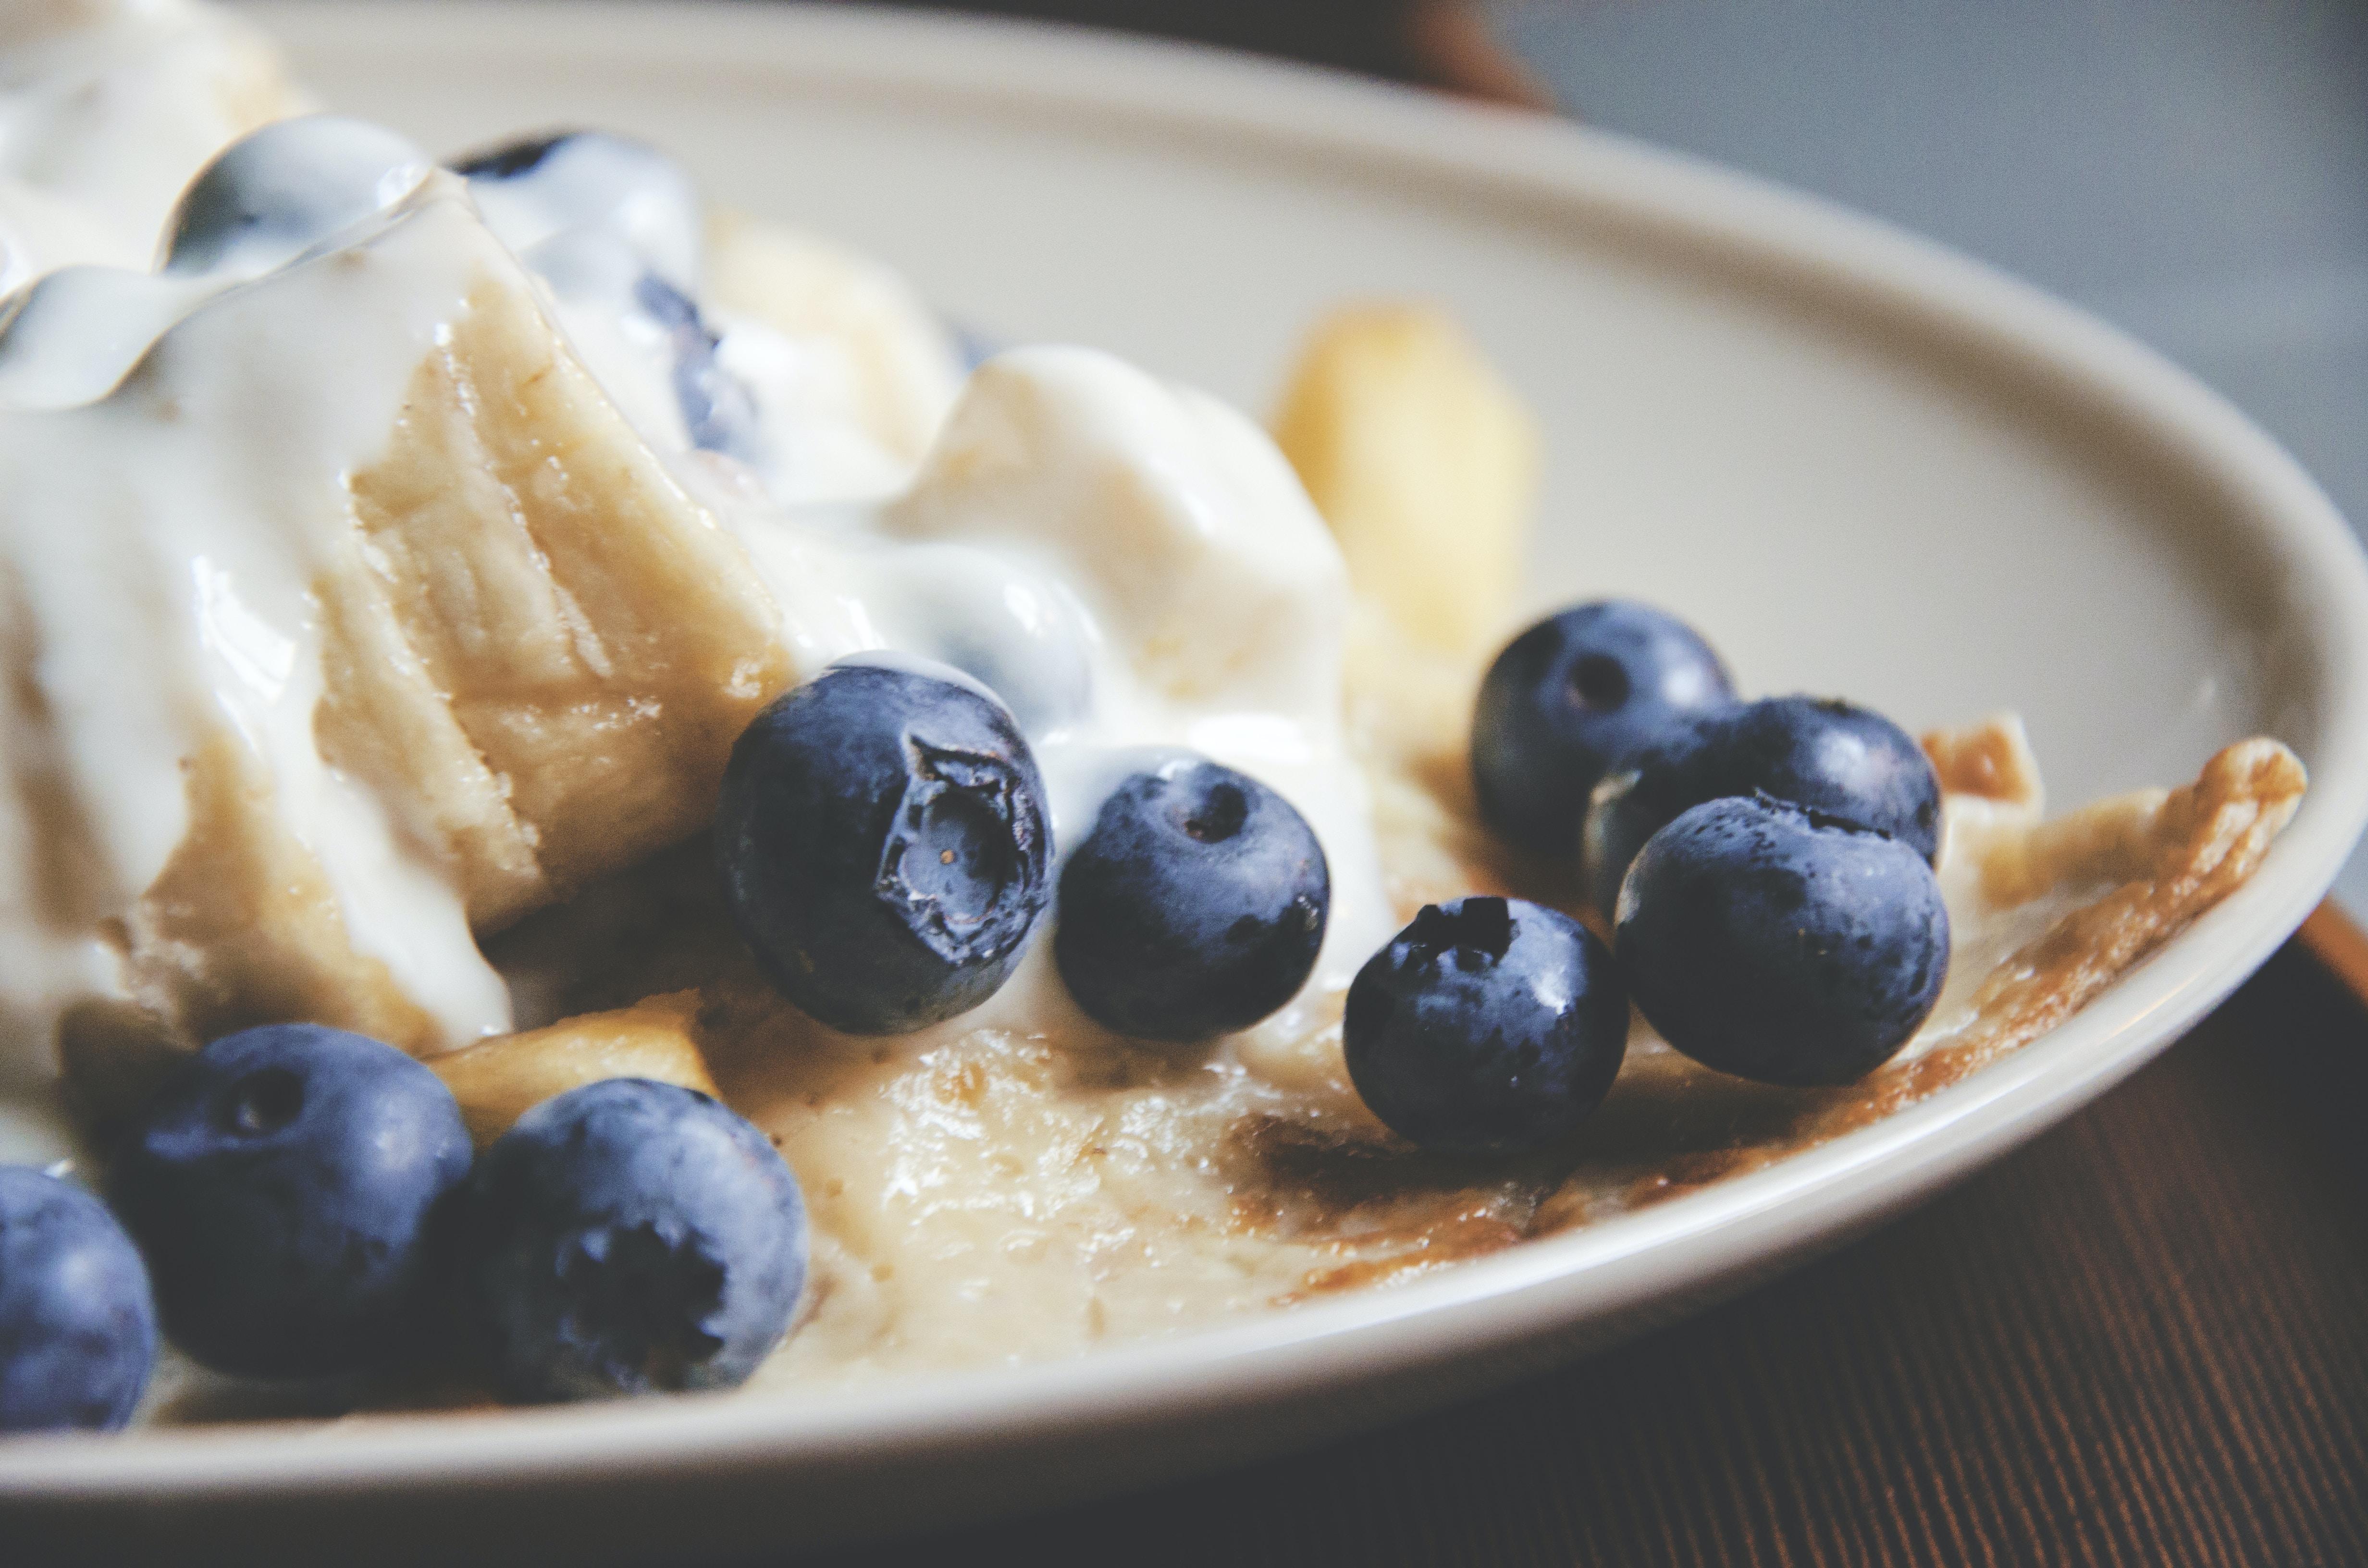 Macro shot of blueberries and yogurt on a homemade dessert tart